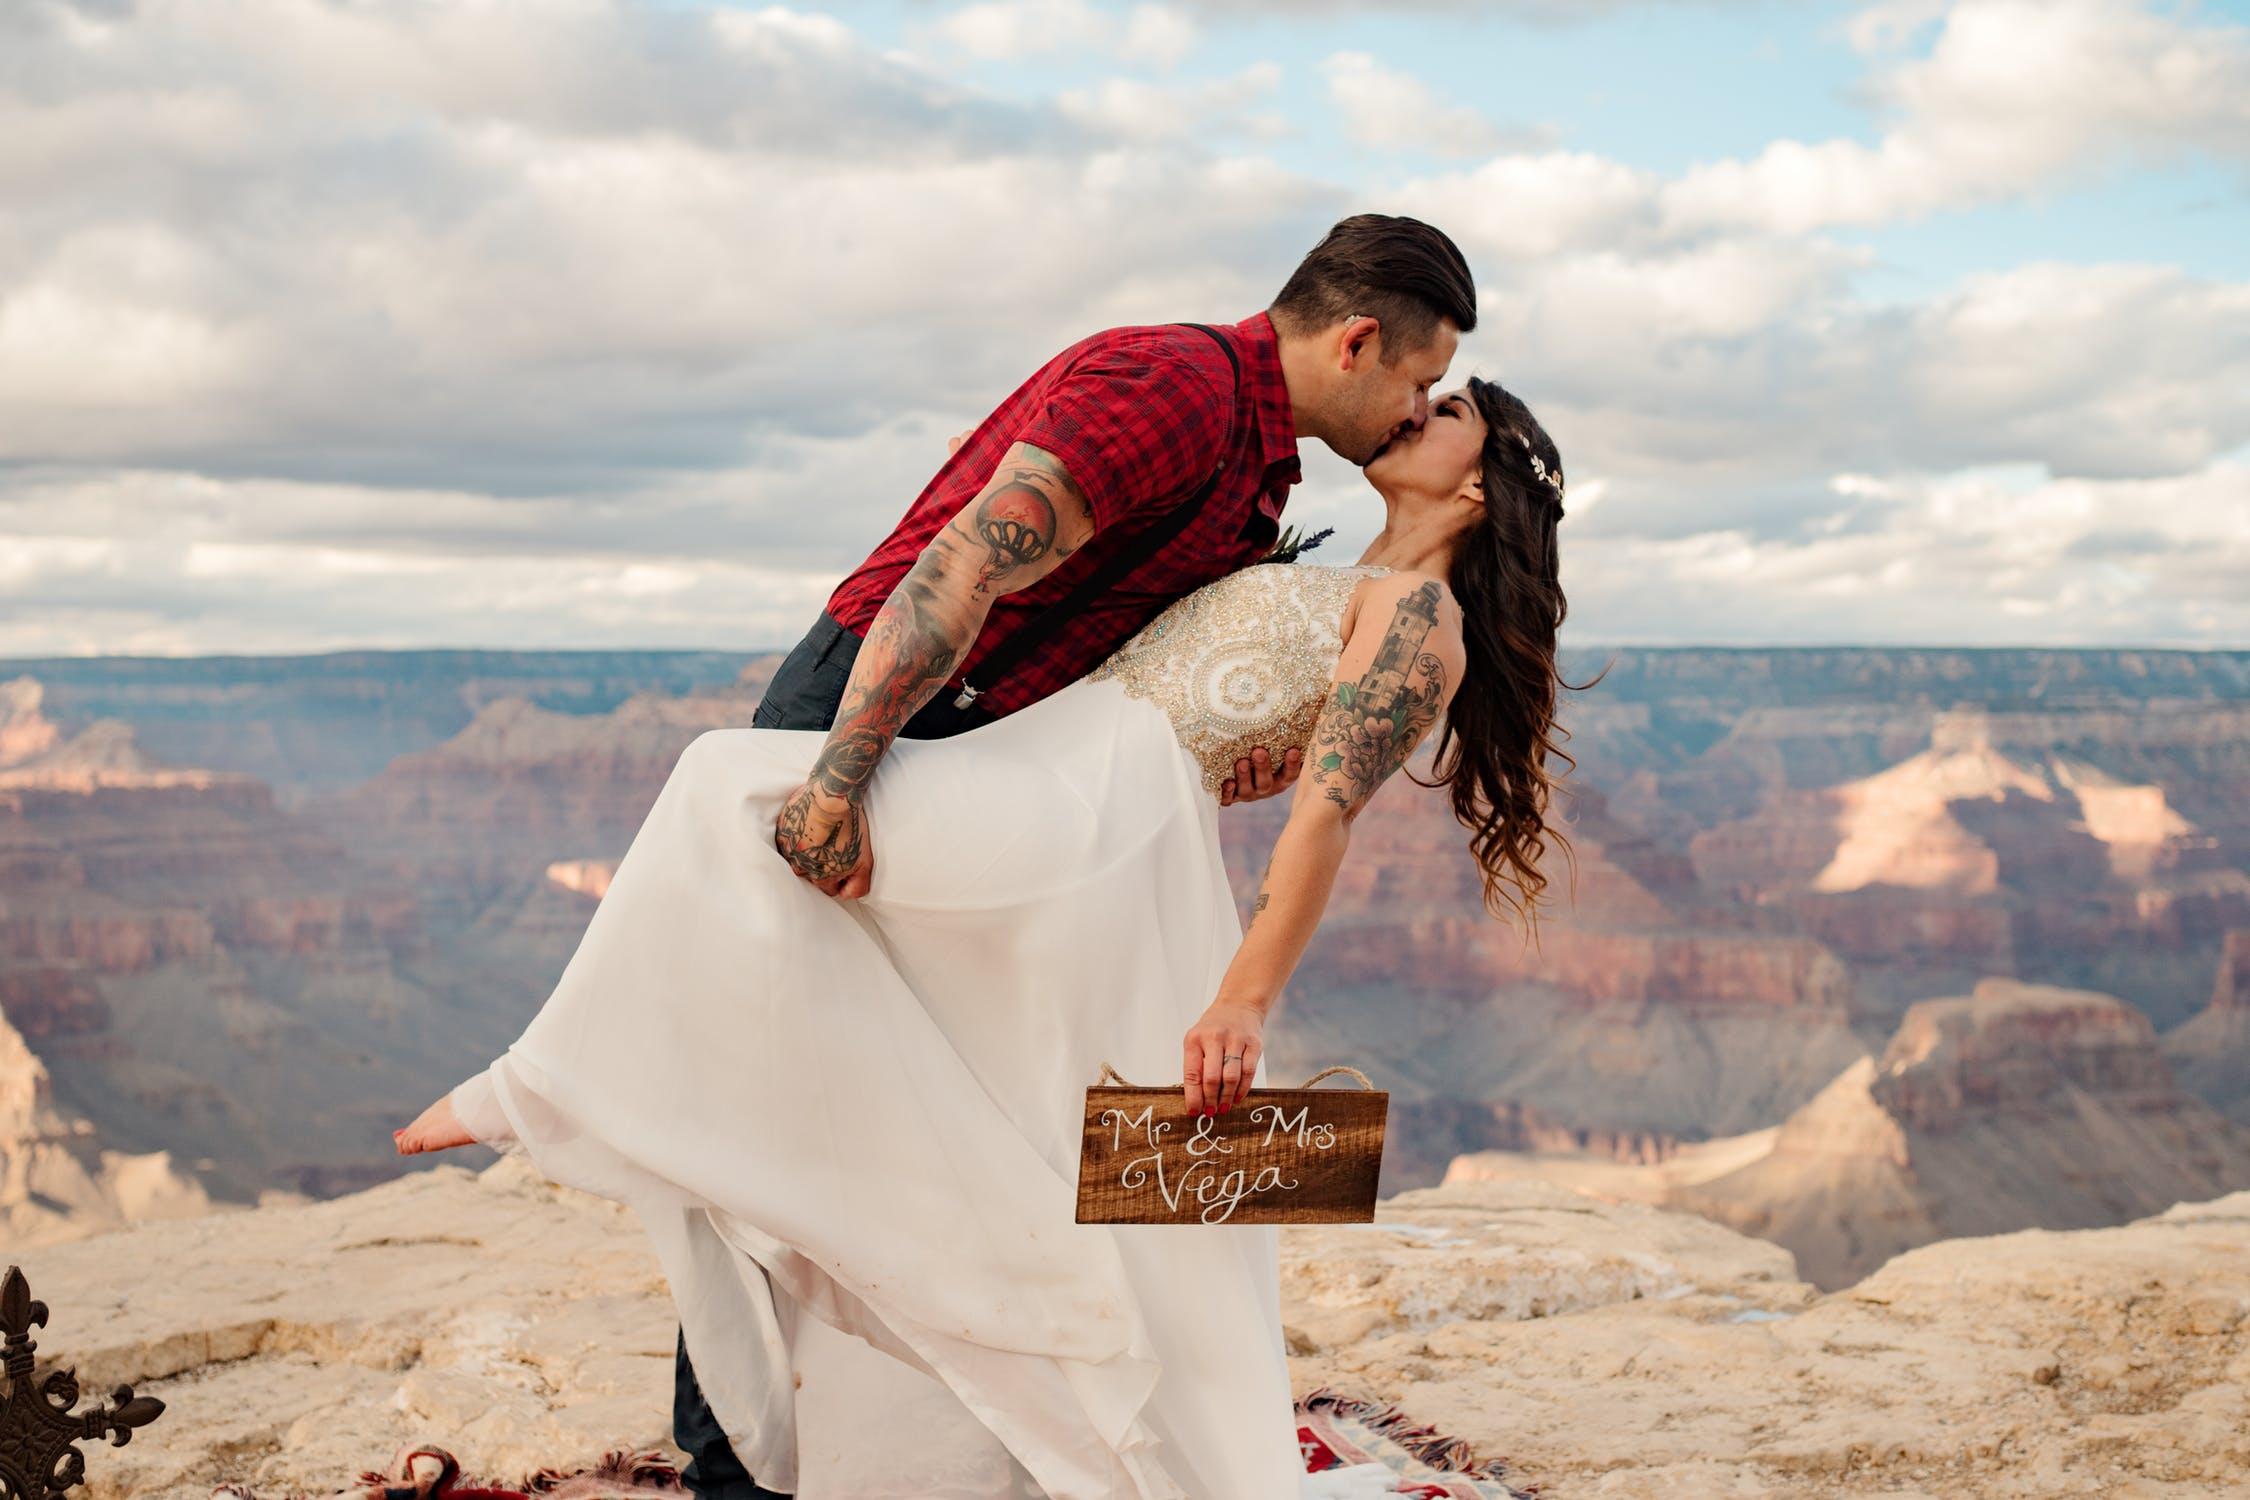 Post-wedding shooting